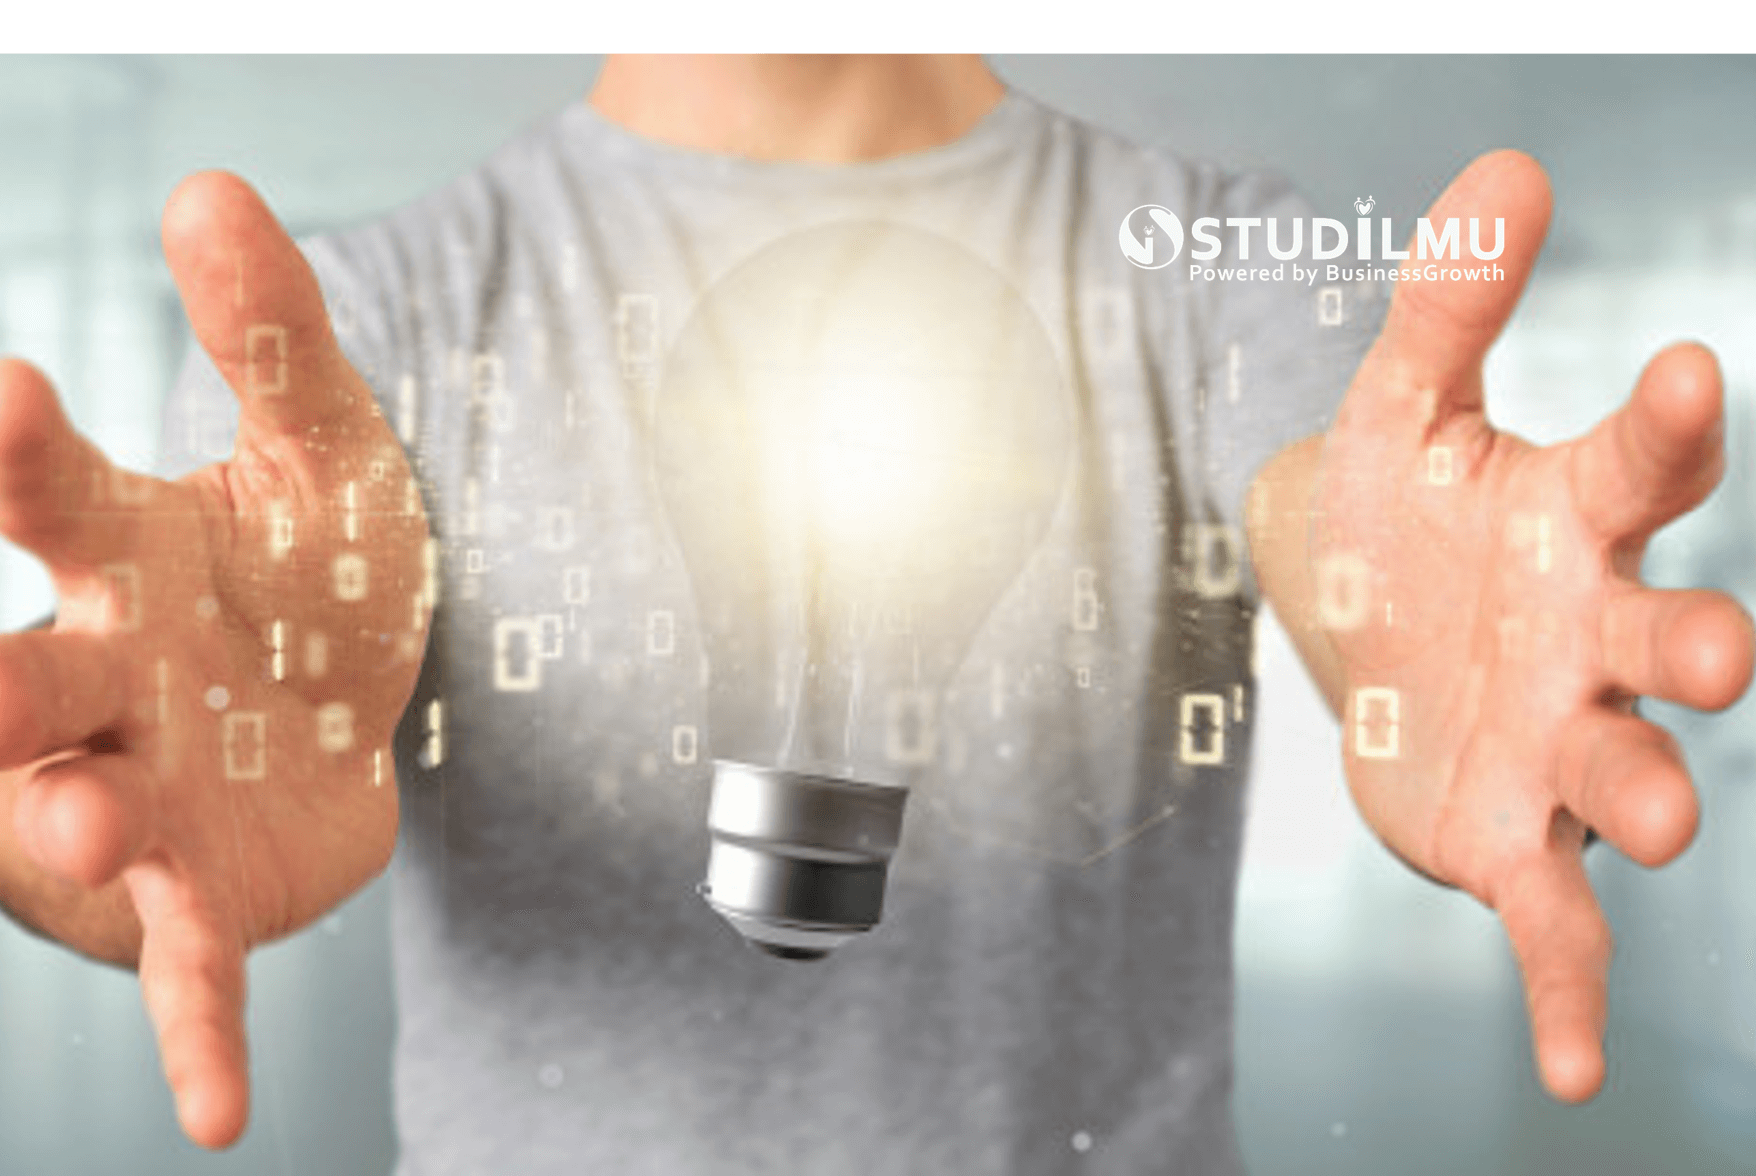 STUDILMU Career Advice - Mitos atau Fakta Dibalik Kesuksesan Perusahaan Startup